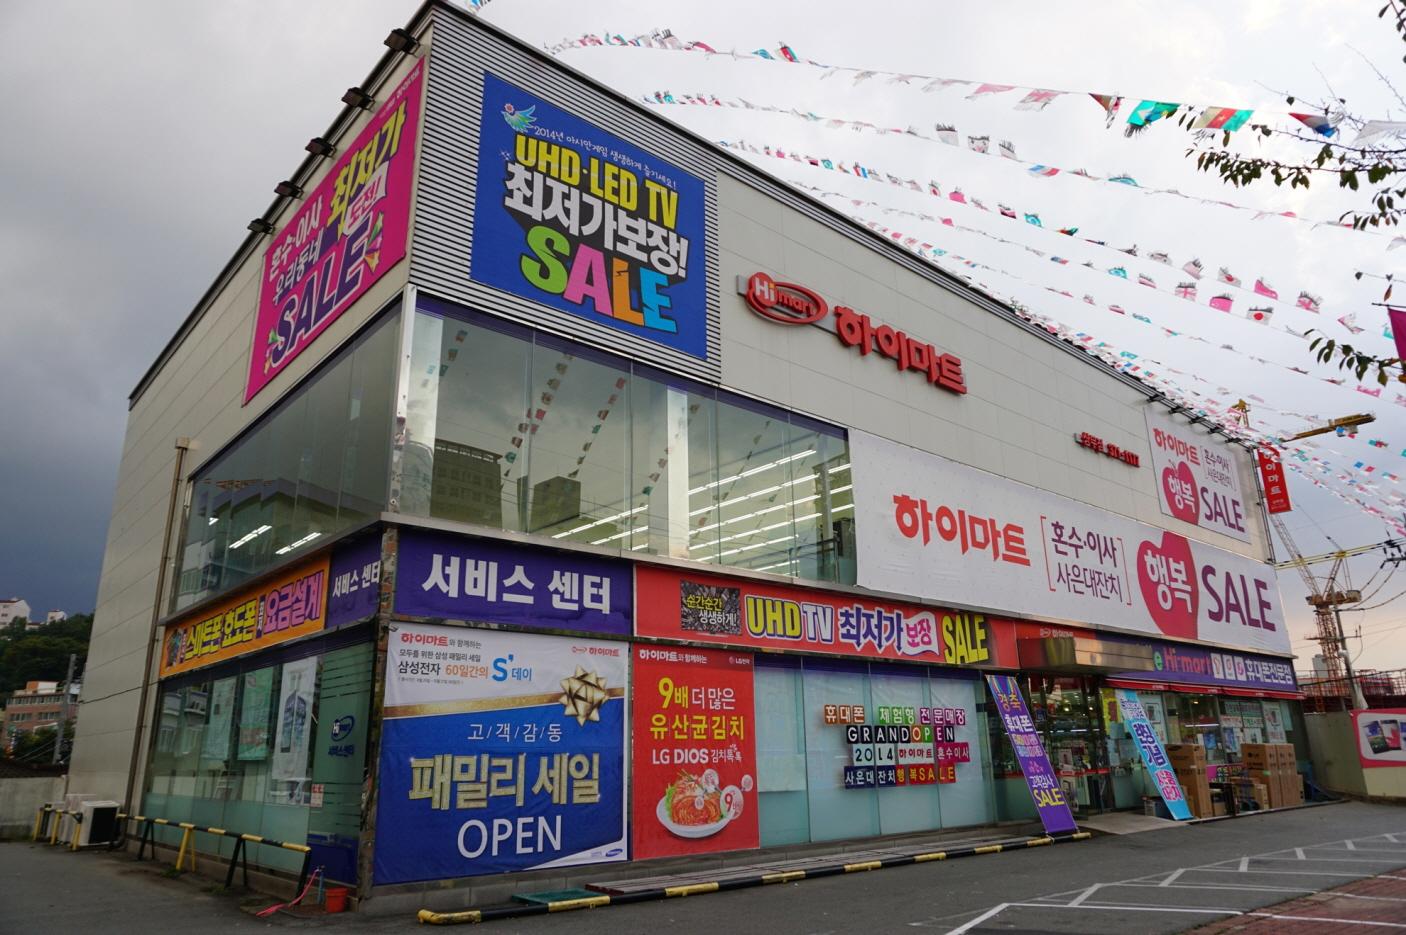 Lotte Hi-mart – Sangmu Branch (롯데 하이마트 (상무점))